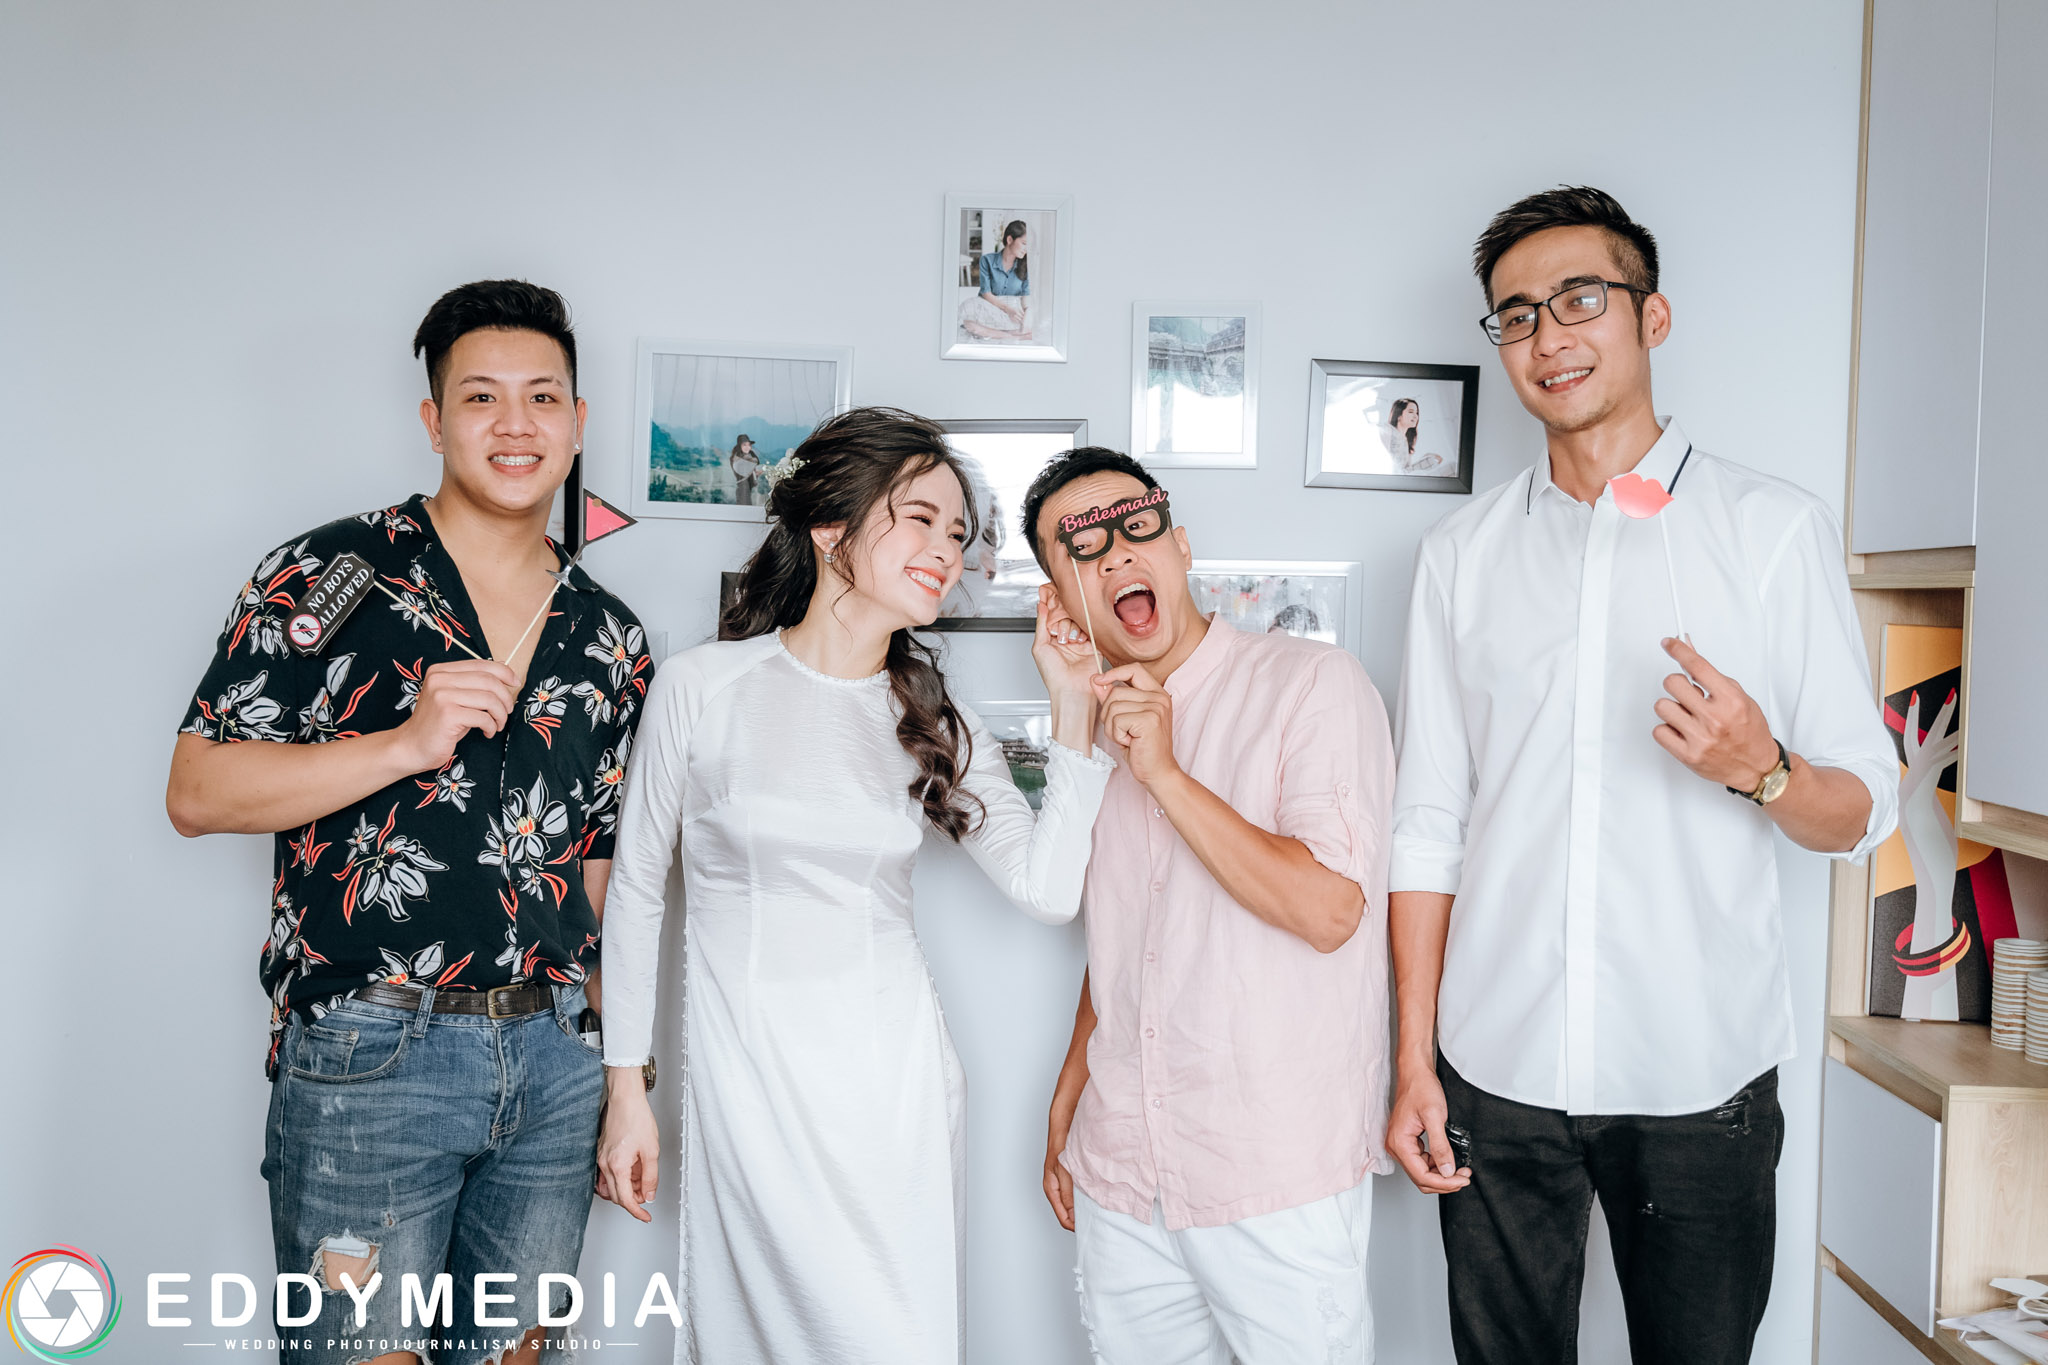 MinhQuang PhuongLinh LongVyPalace EddyMedia 21